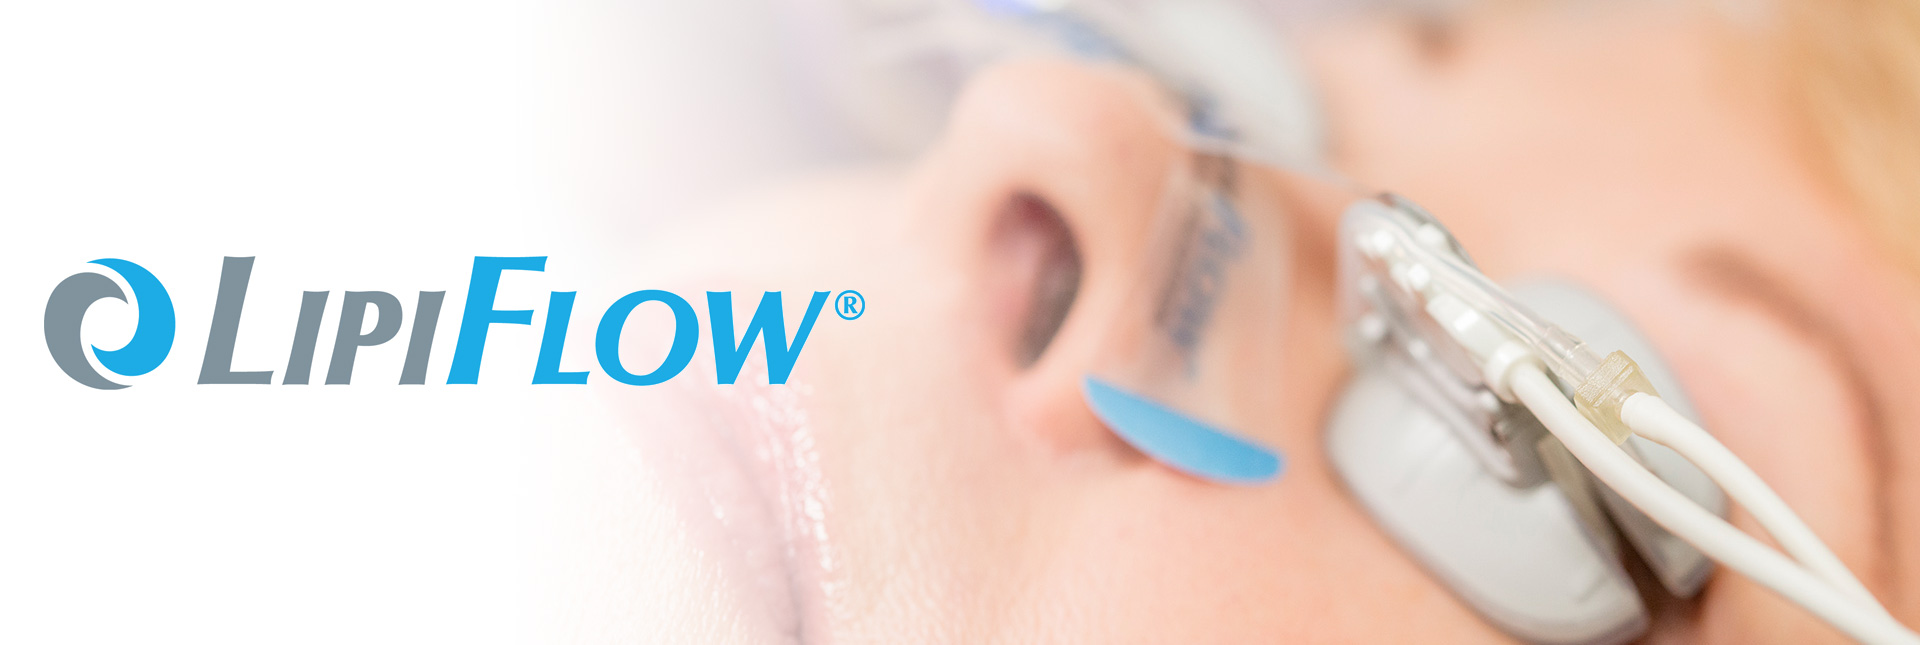 Lipiflow ad